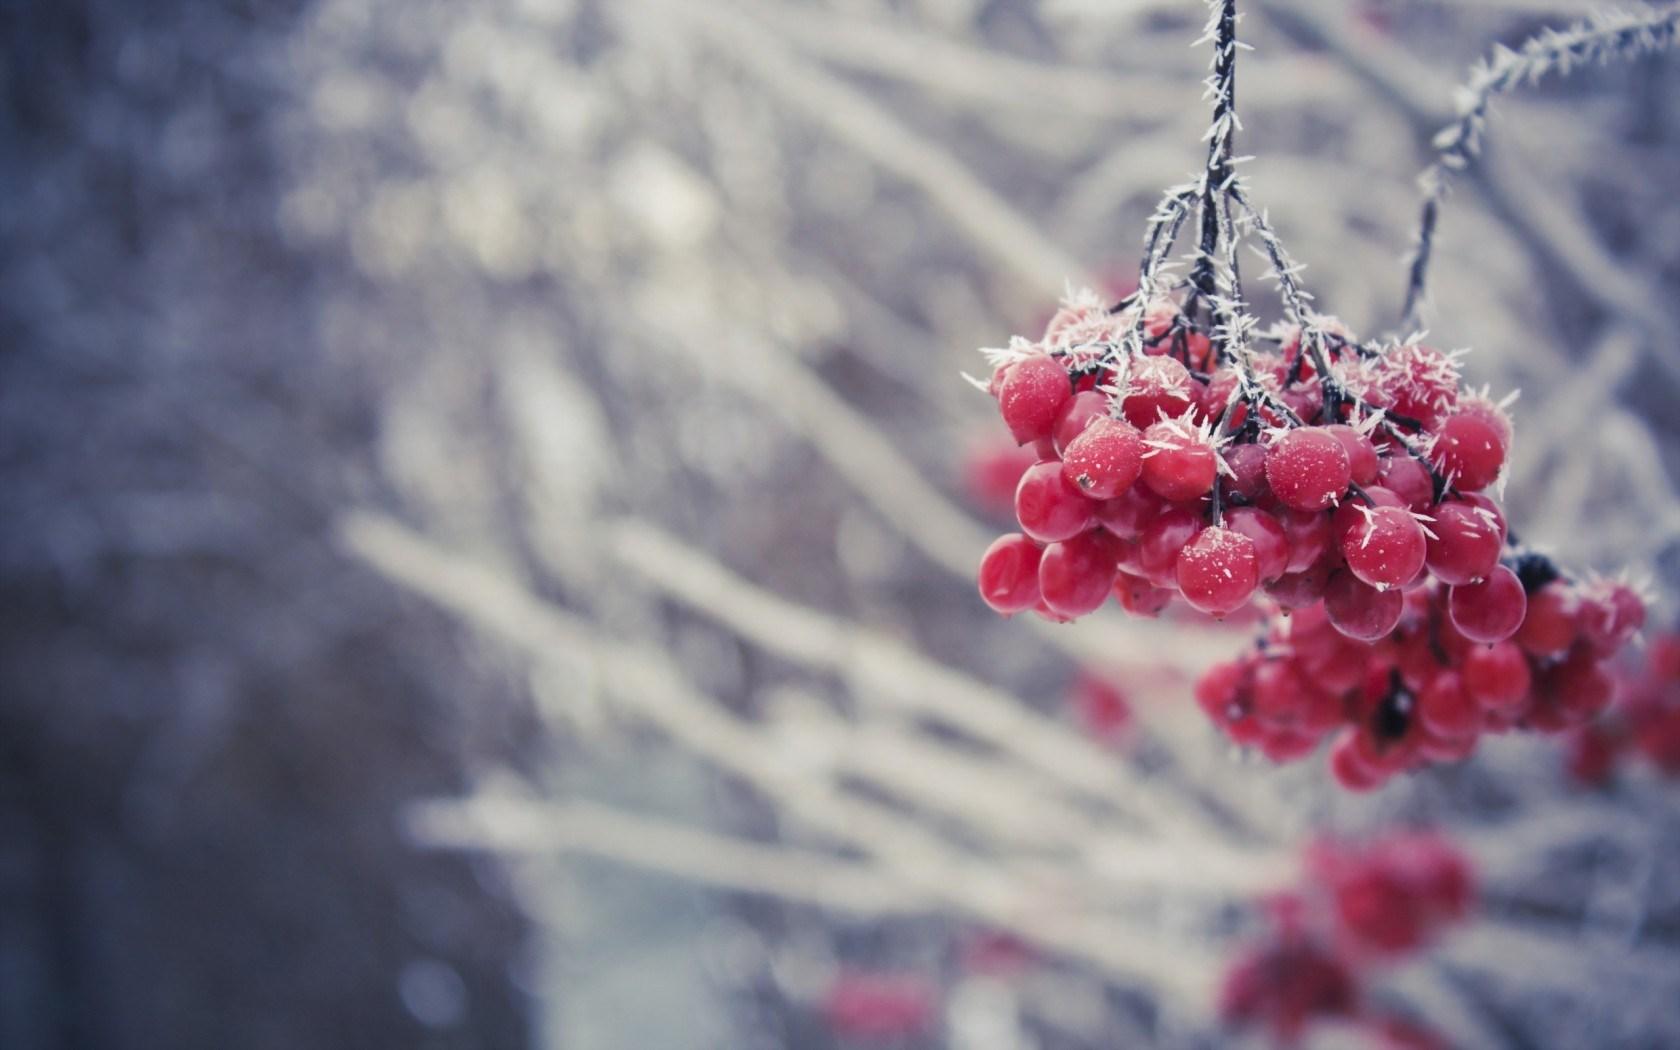 scenic winter beautiful wallpapers - photo #44